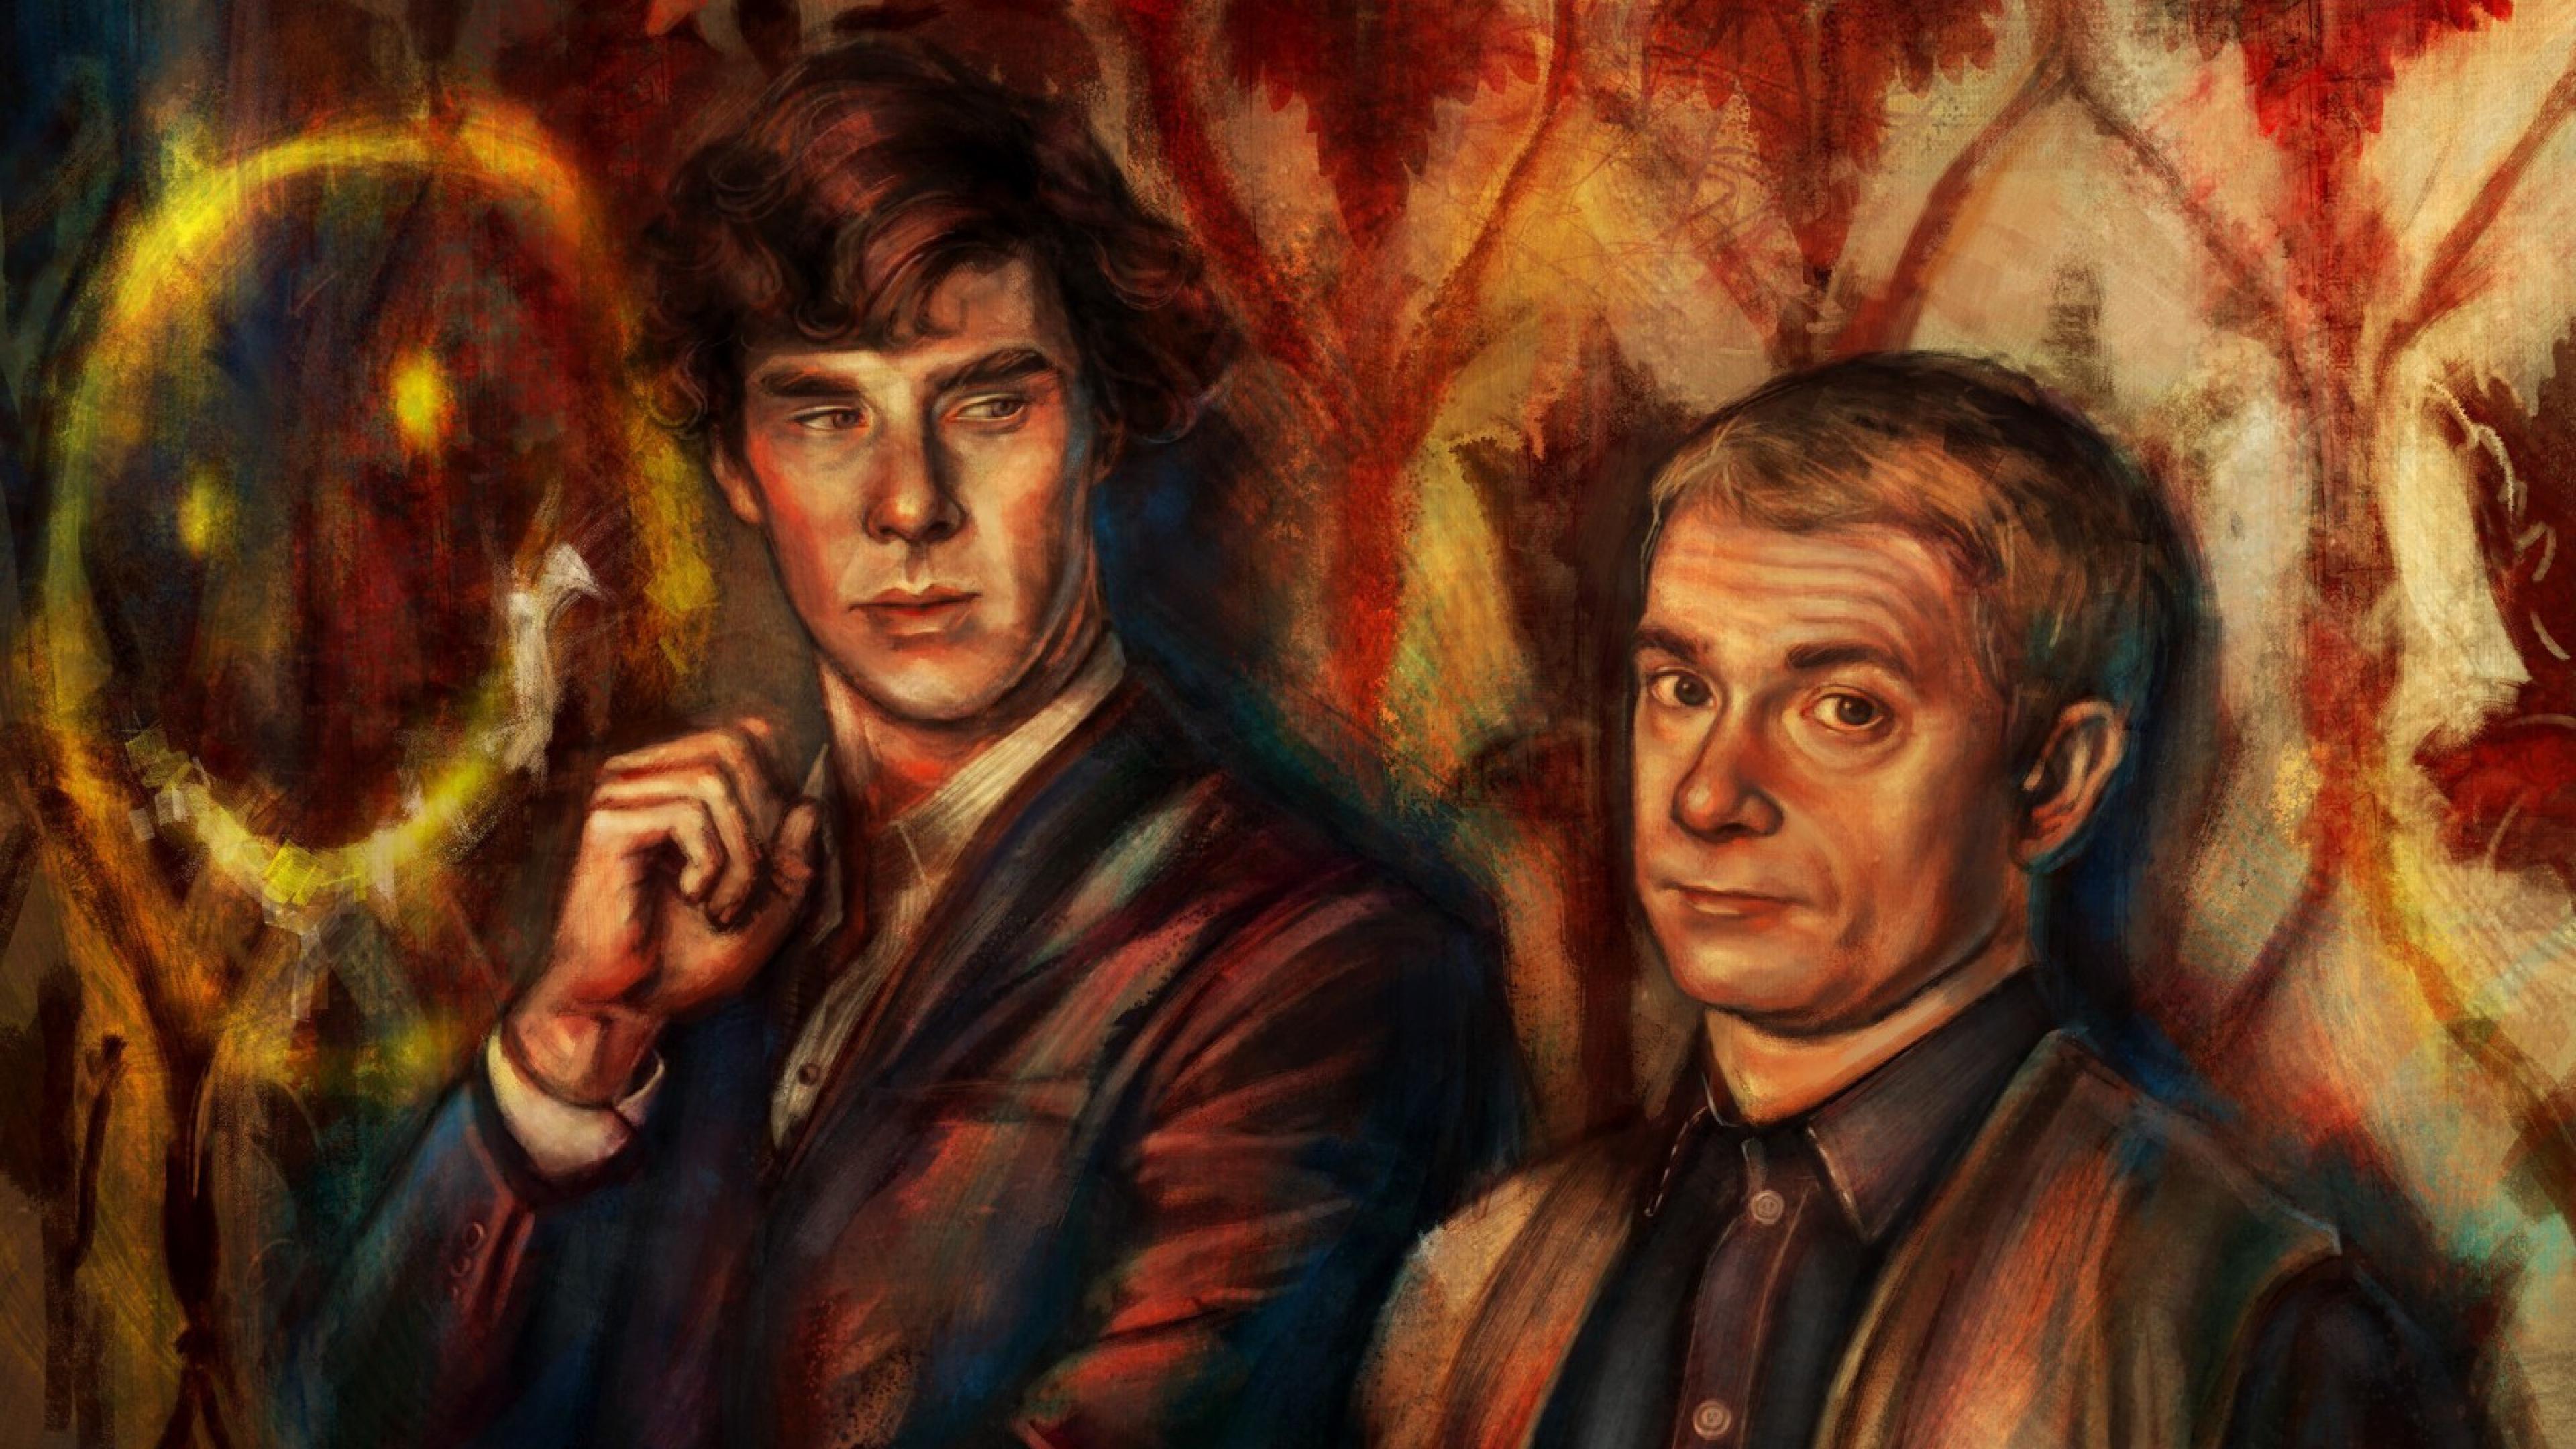 The Fall Bbc Wallpaper Sherlock Wallpapers Hd Pixelstalk Net